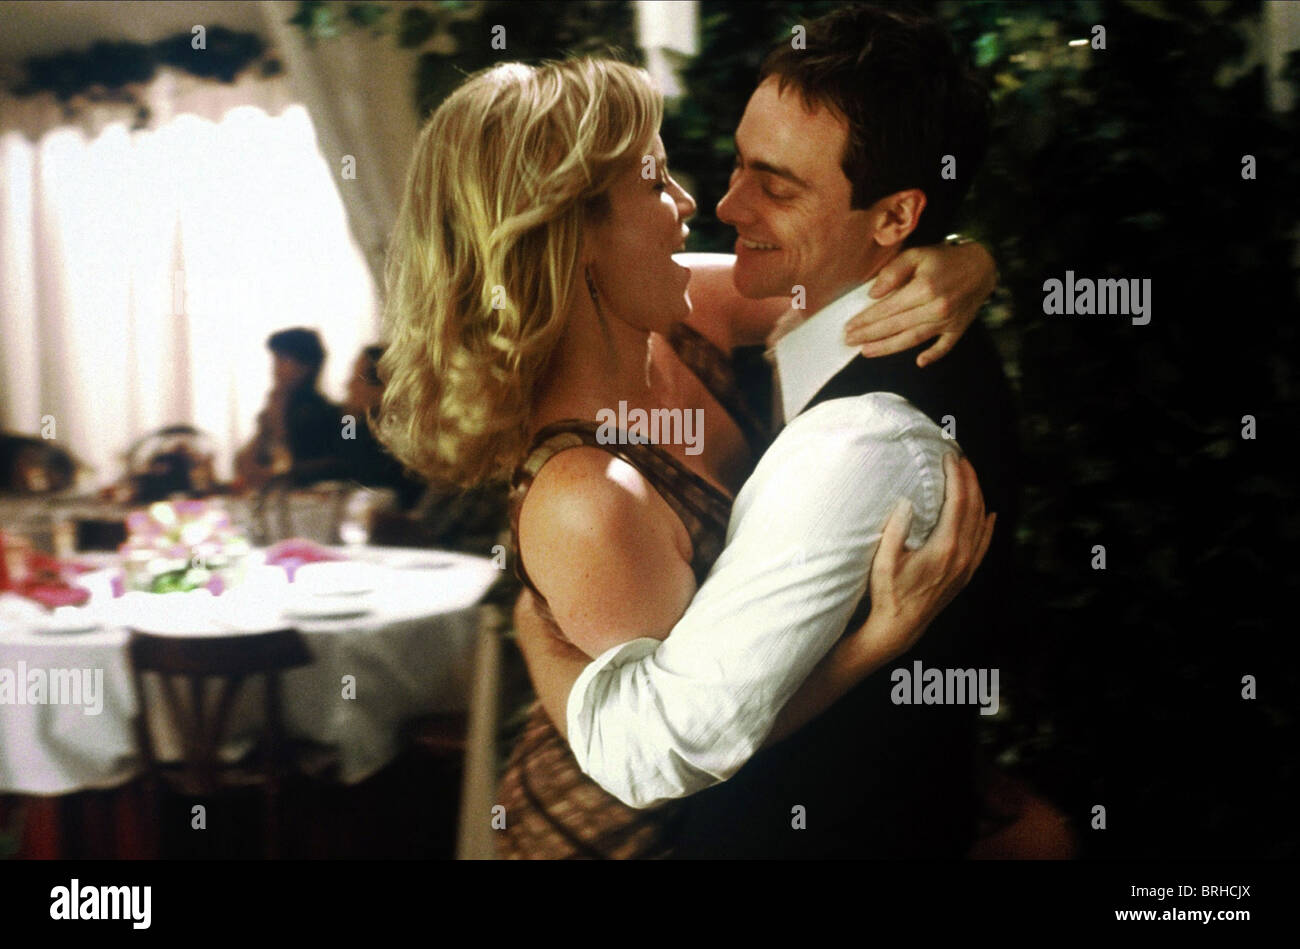 Amy dating Stuart